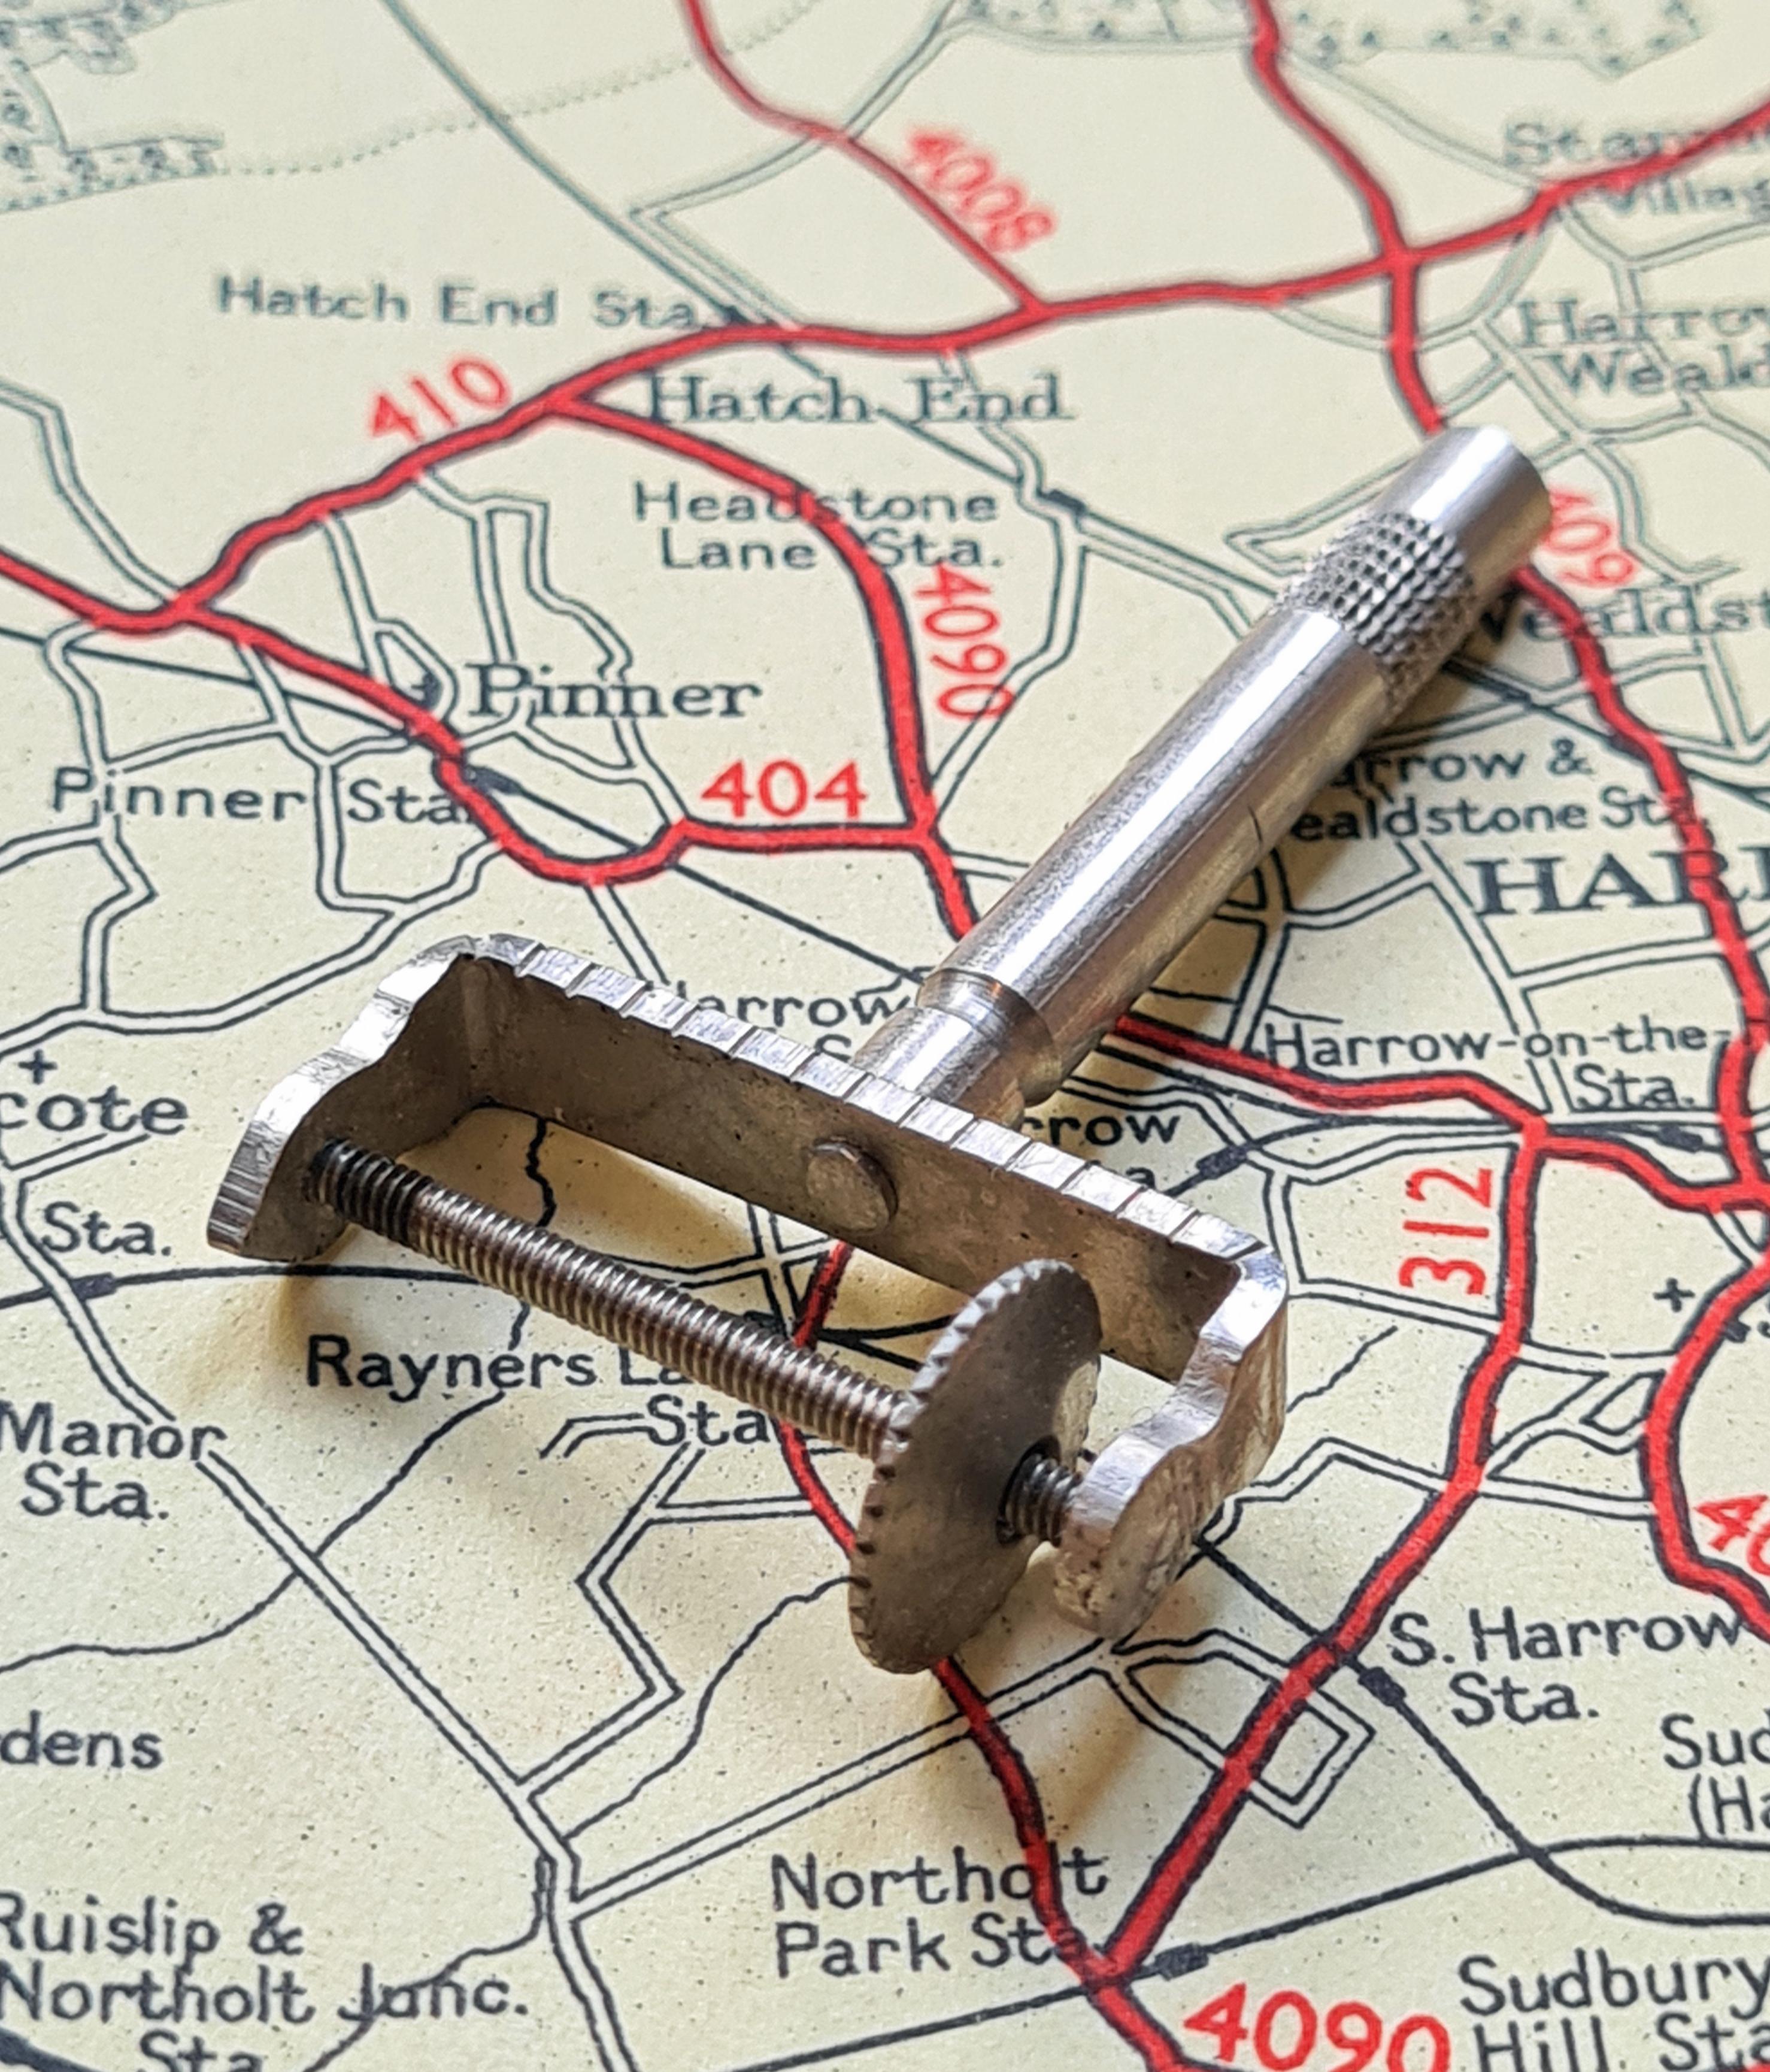 Philips' Universal Map Measurer